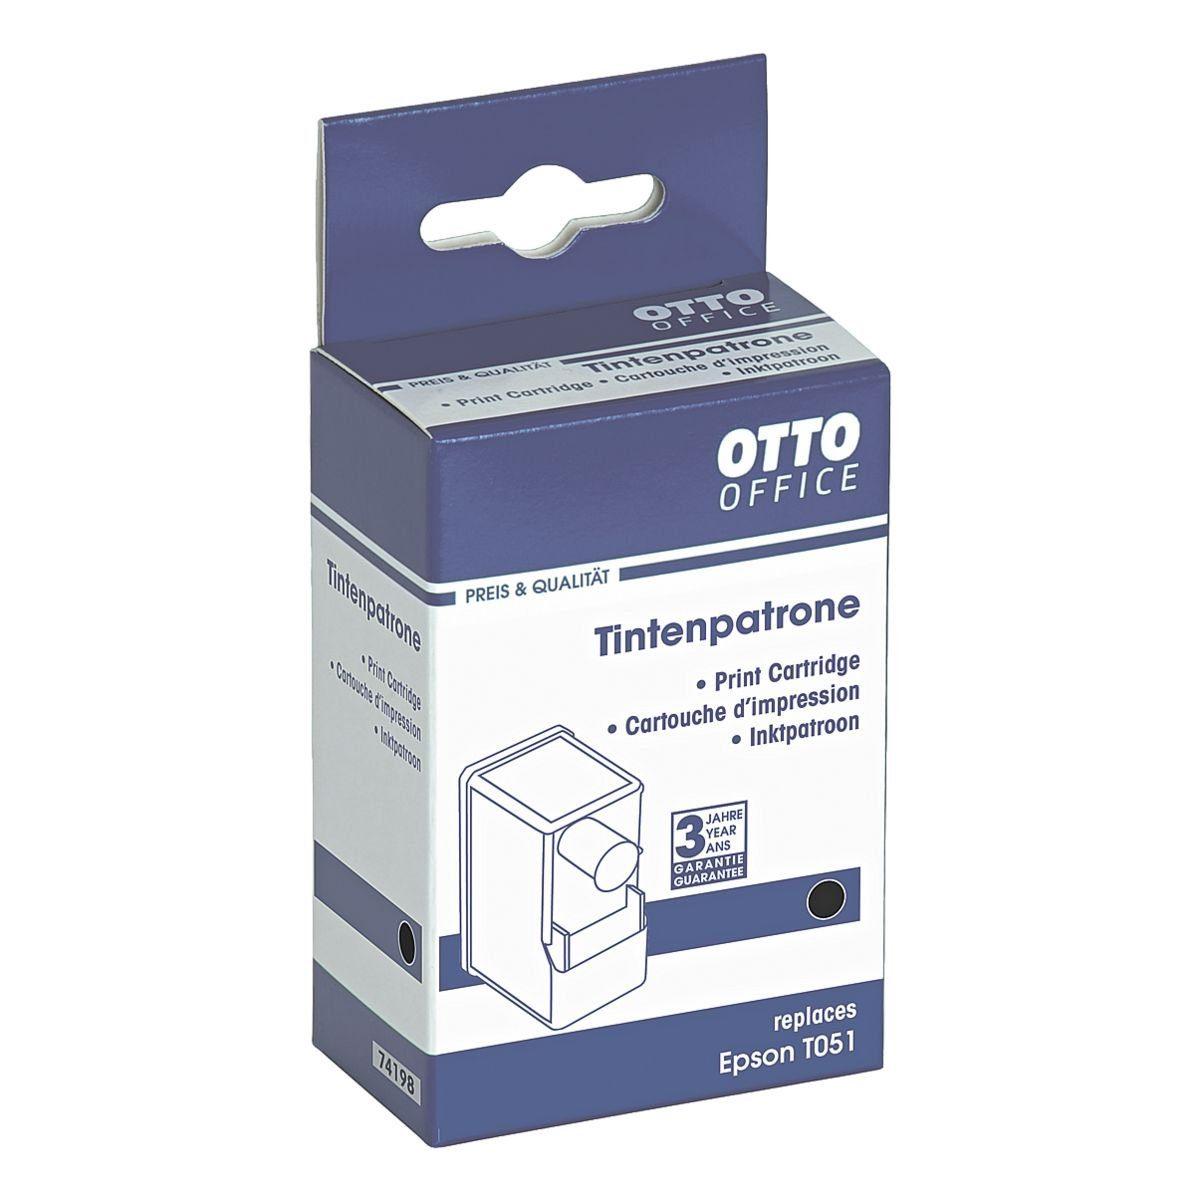 OTTO Office Standard Tintenpatrone ersetzt Epson »T0511«